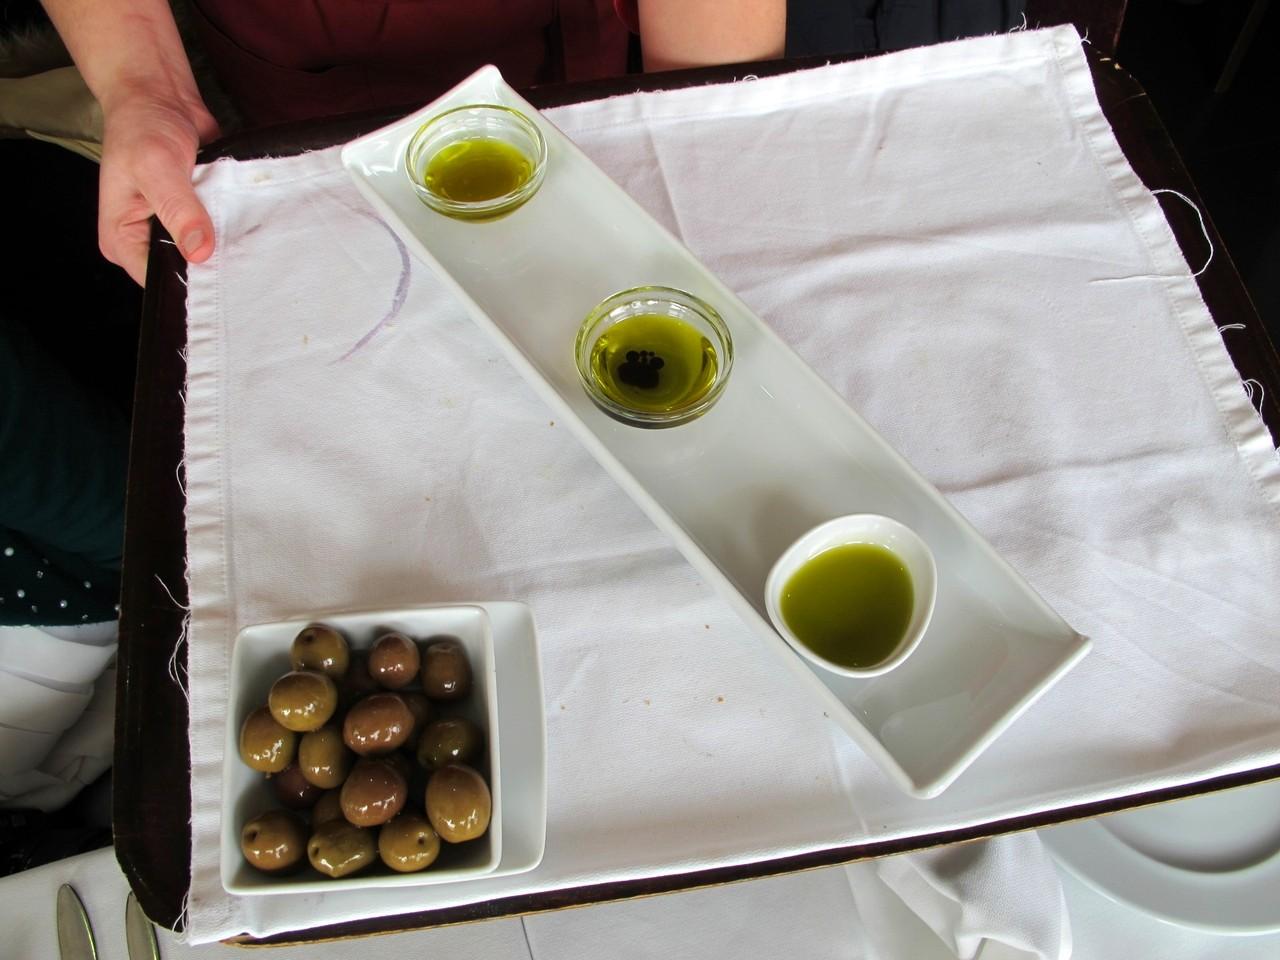 Azeitonas & Azeites... de Trás-os-Montes